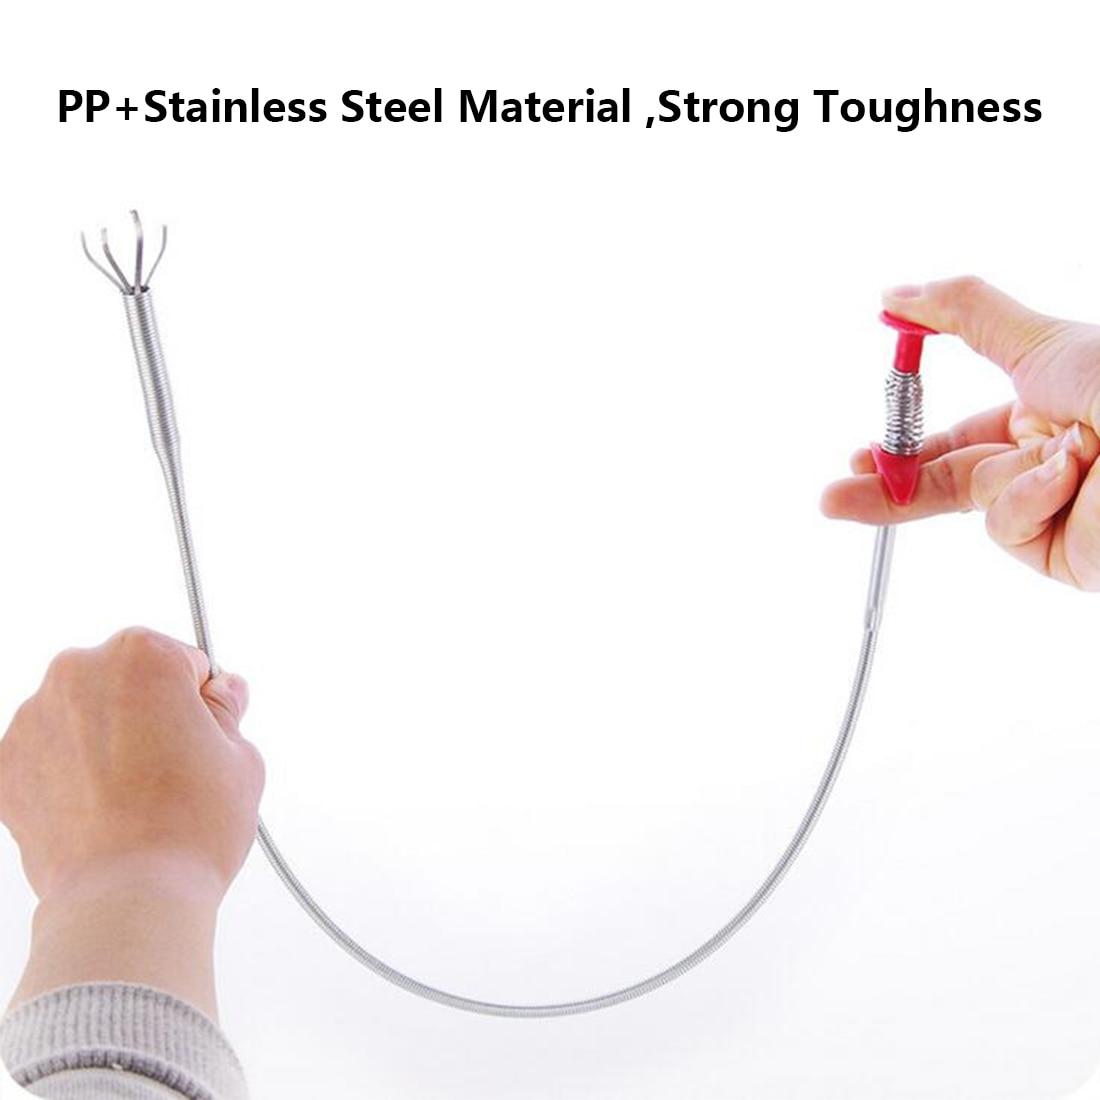 Reach Flexible Claw Pick Up Narrow Bend Curve Grabber H2I9 Long Spring Tool D1Q5